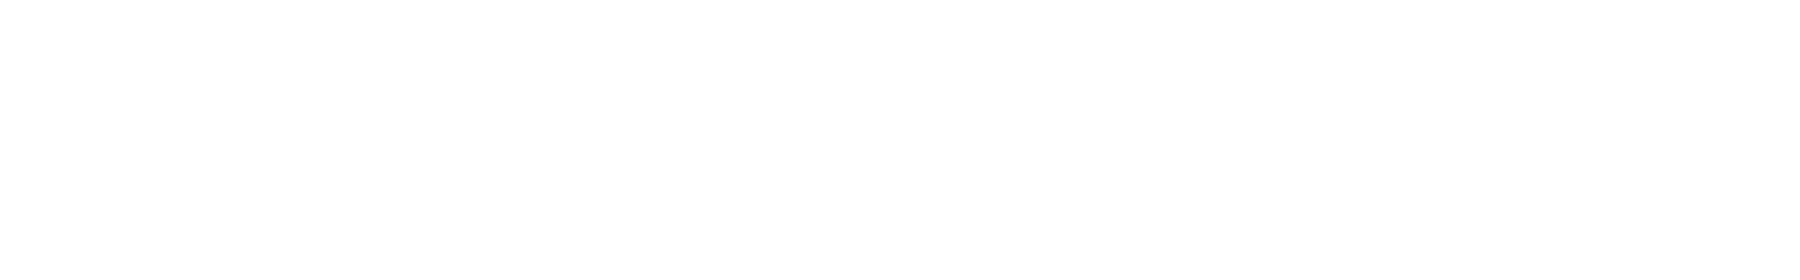 flute   158bpm   fmin